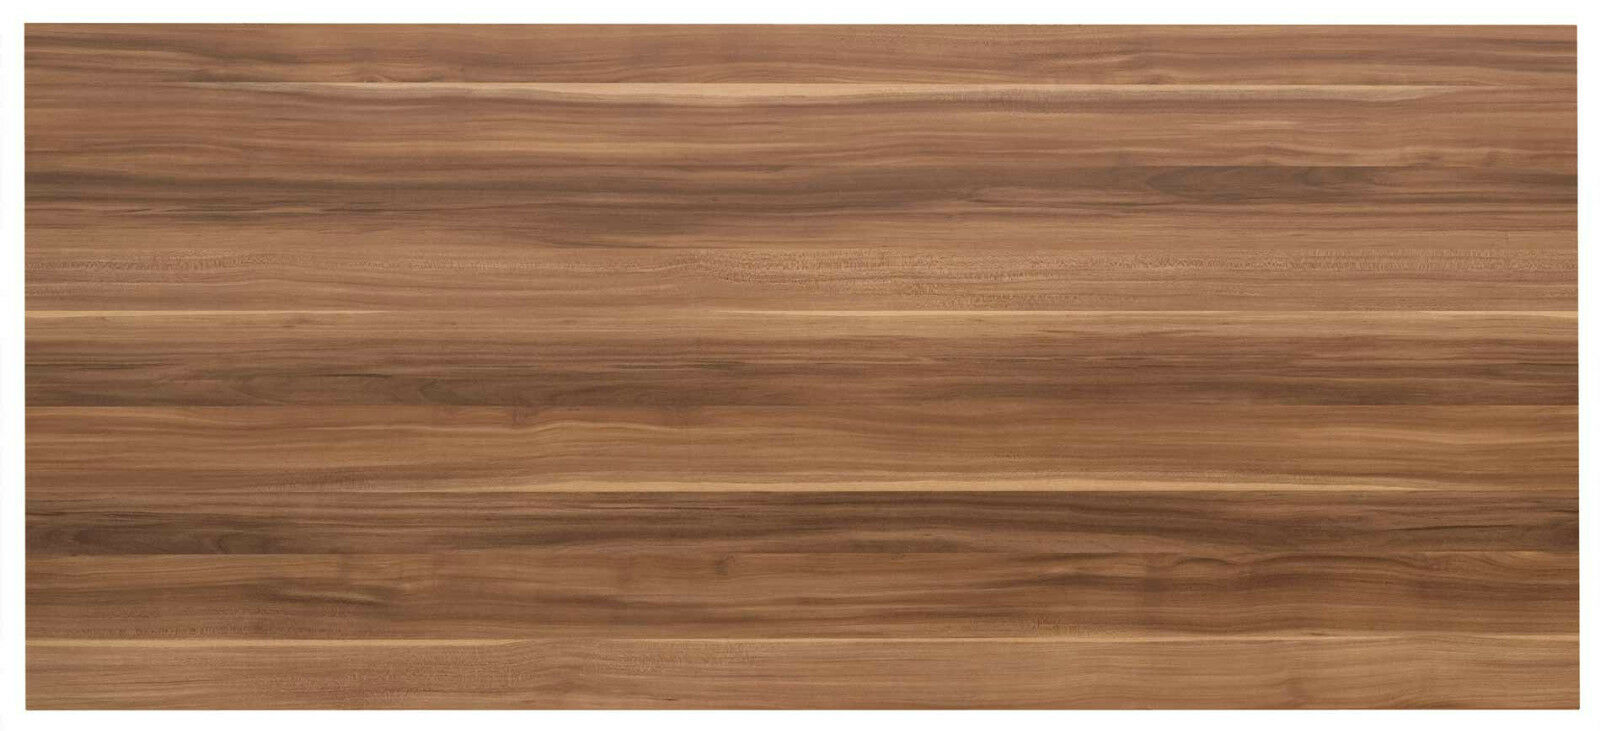 tischplatte 180x80 cm zwetschge schreibtischplatte 180 x 80 cm neu ovp ebay. Black Bedroom Furniture Sets. Home Design Ideas